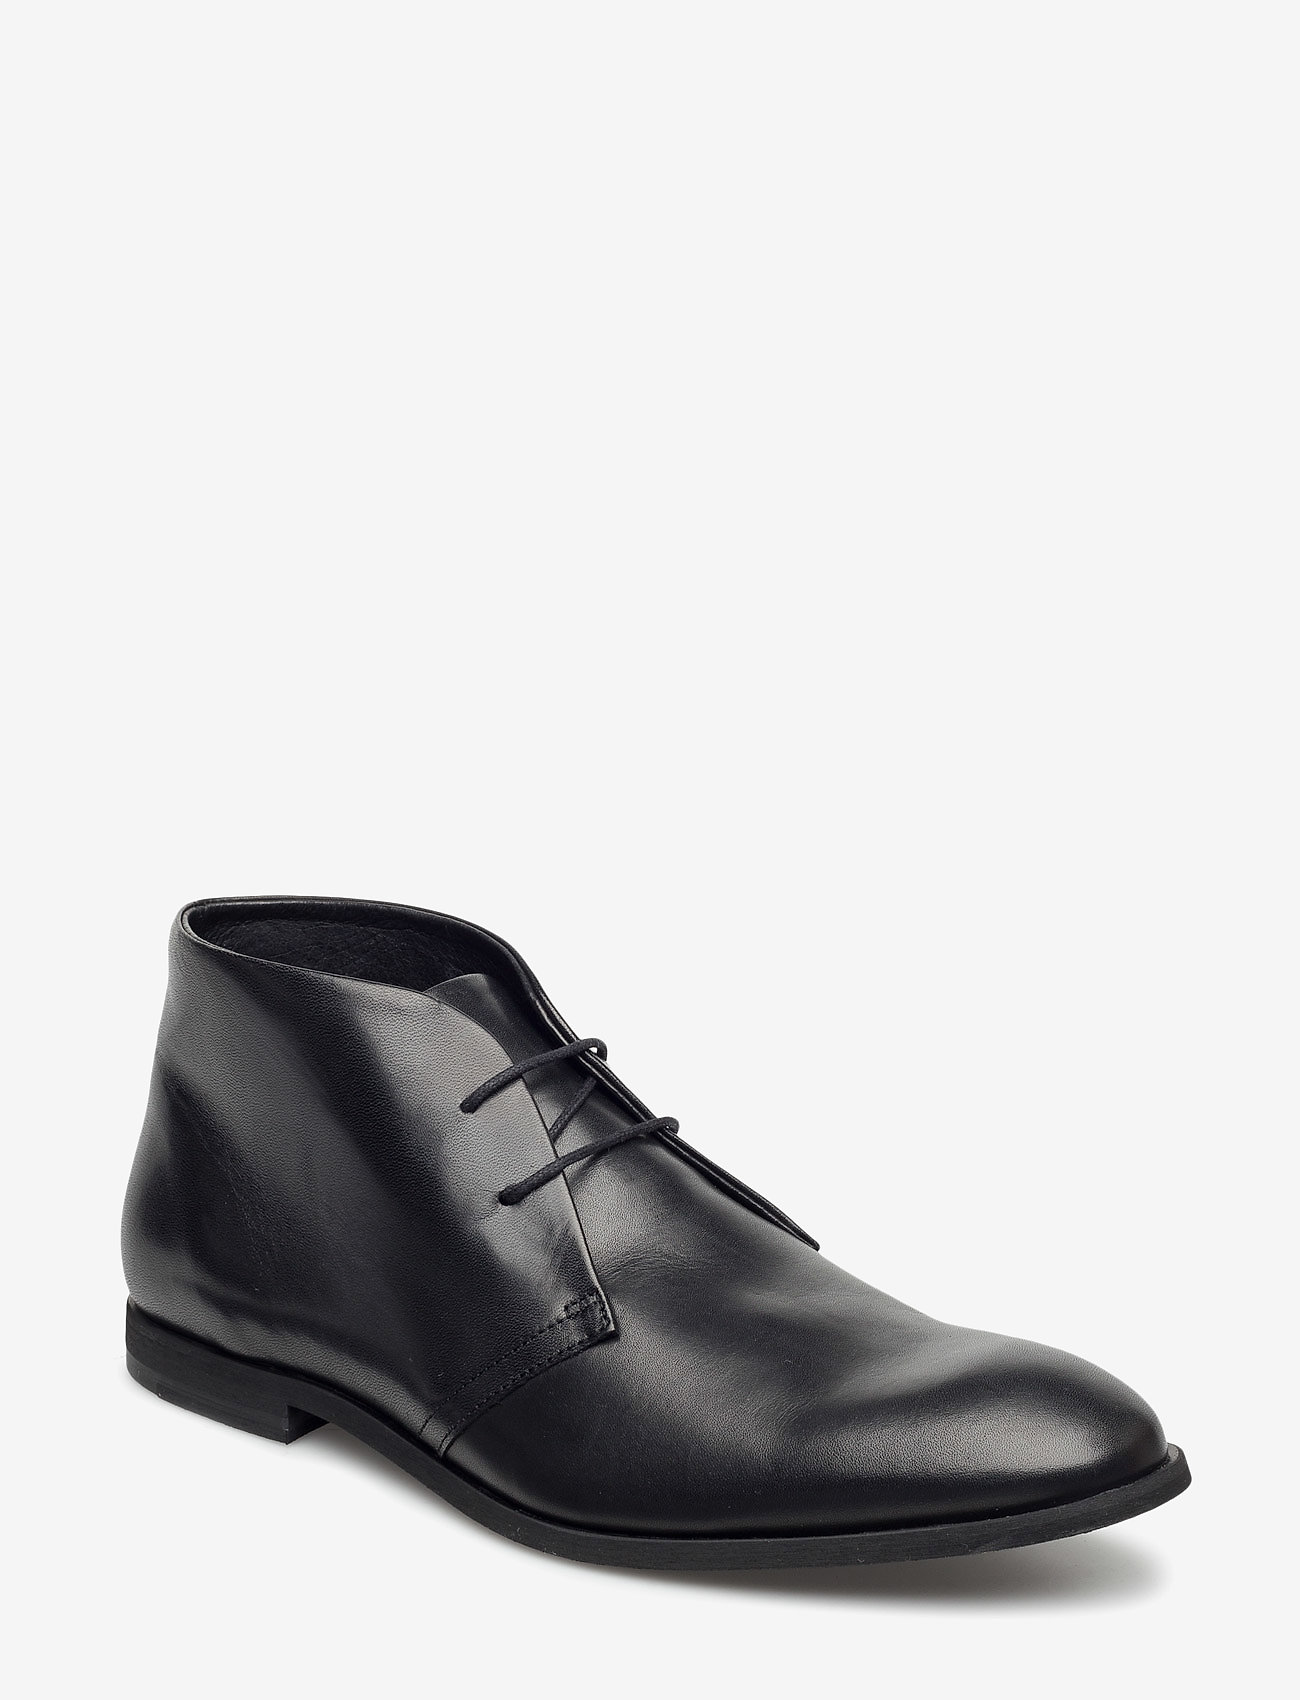 Lindbergh - Leather boot - desert boots - black - 0